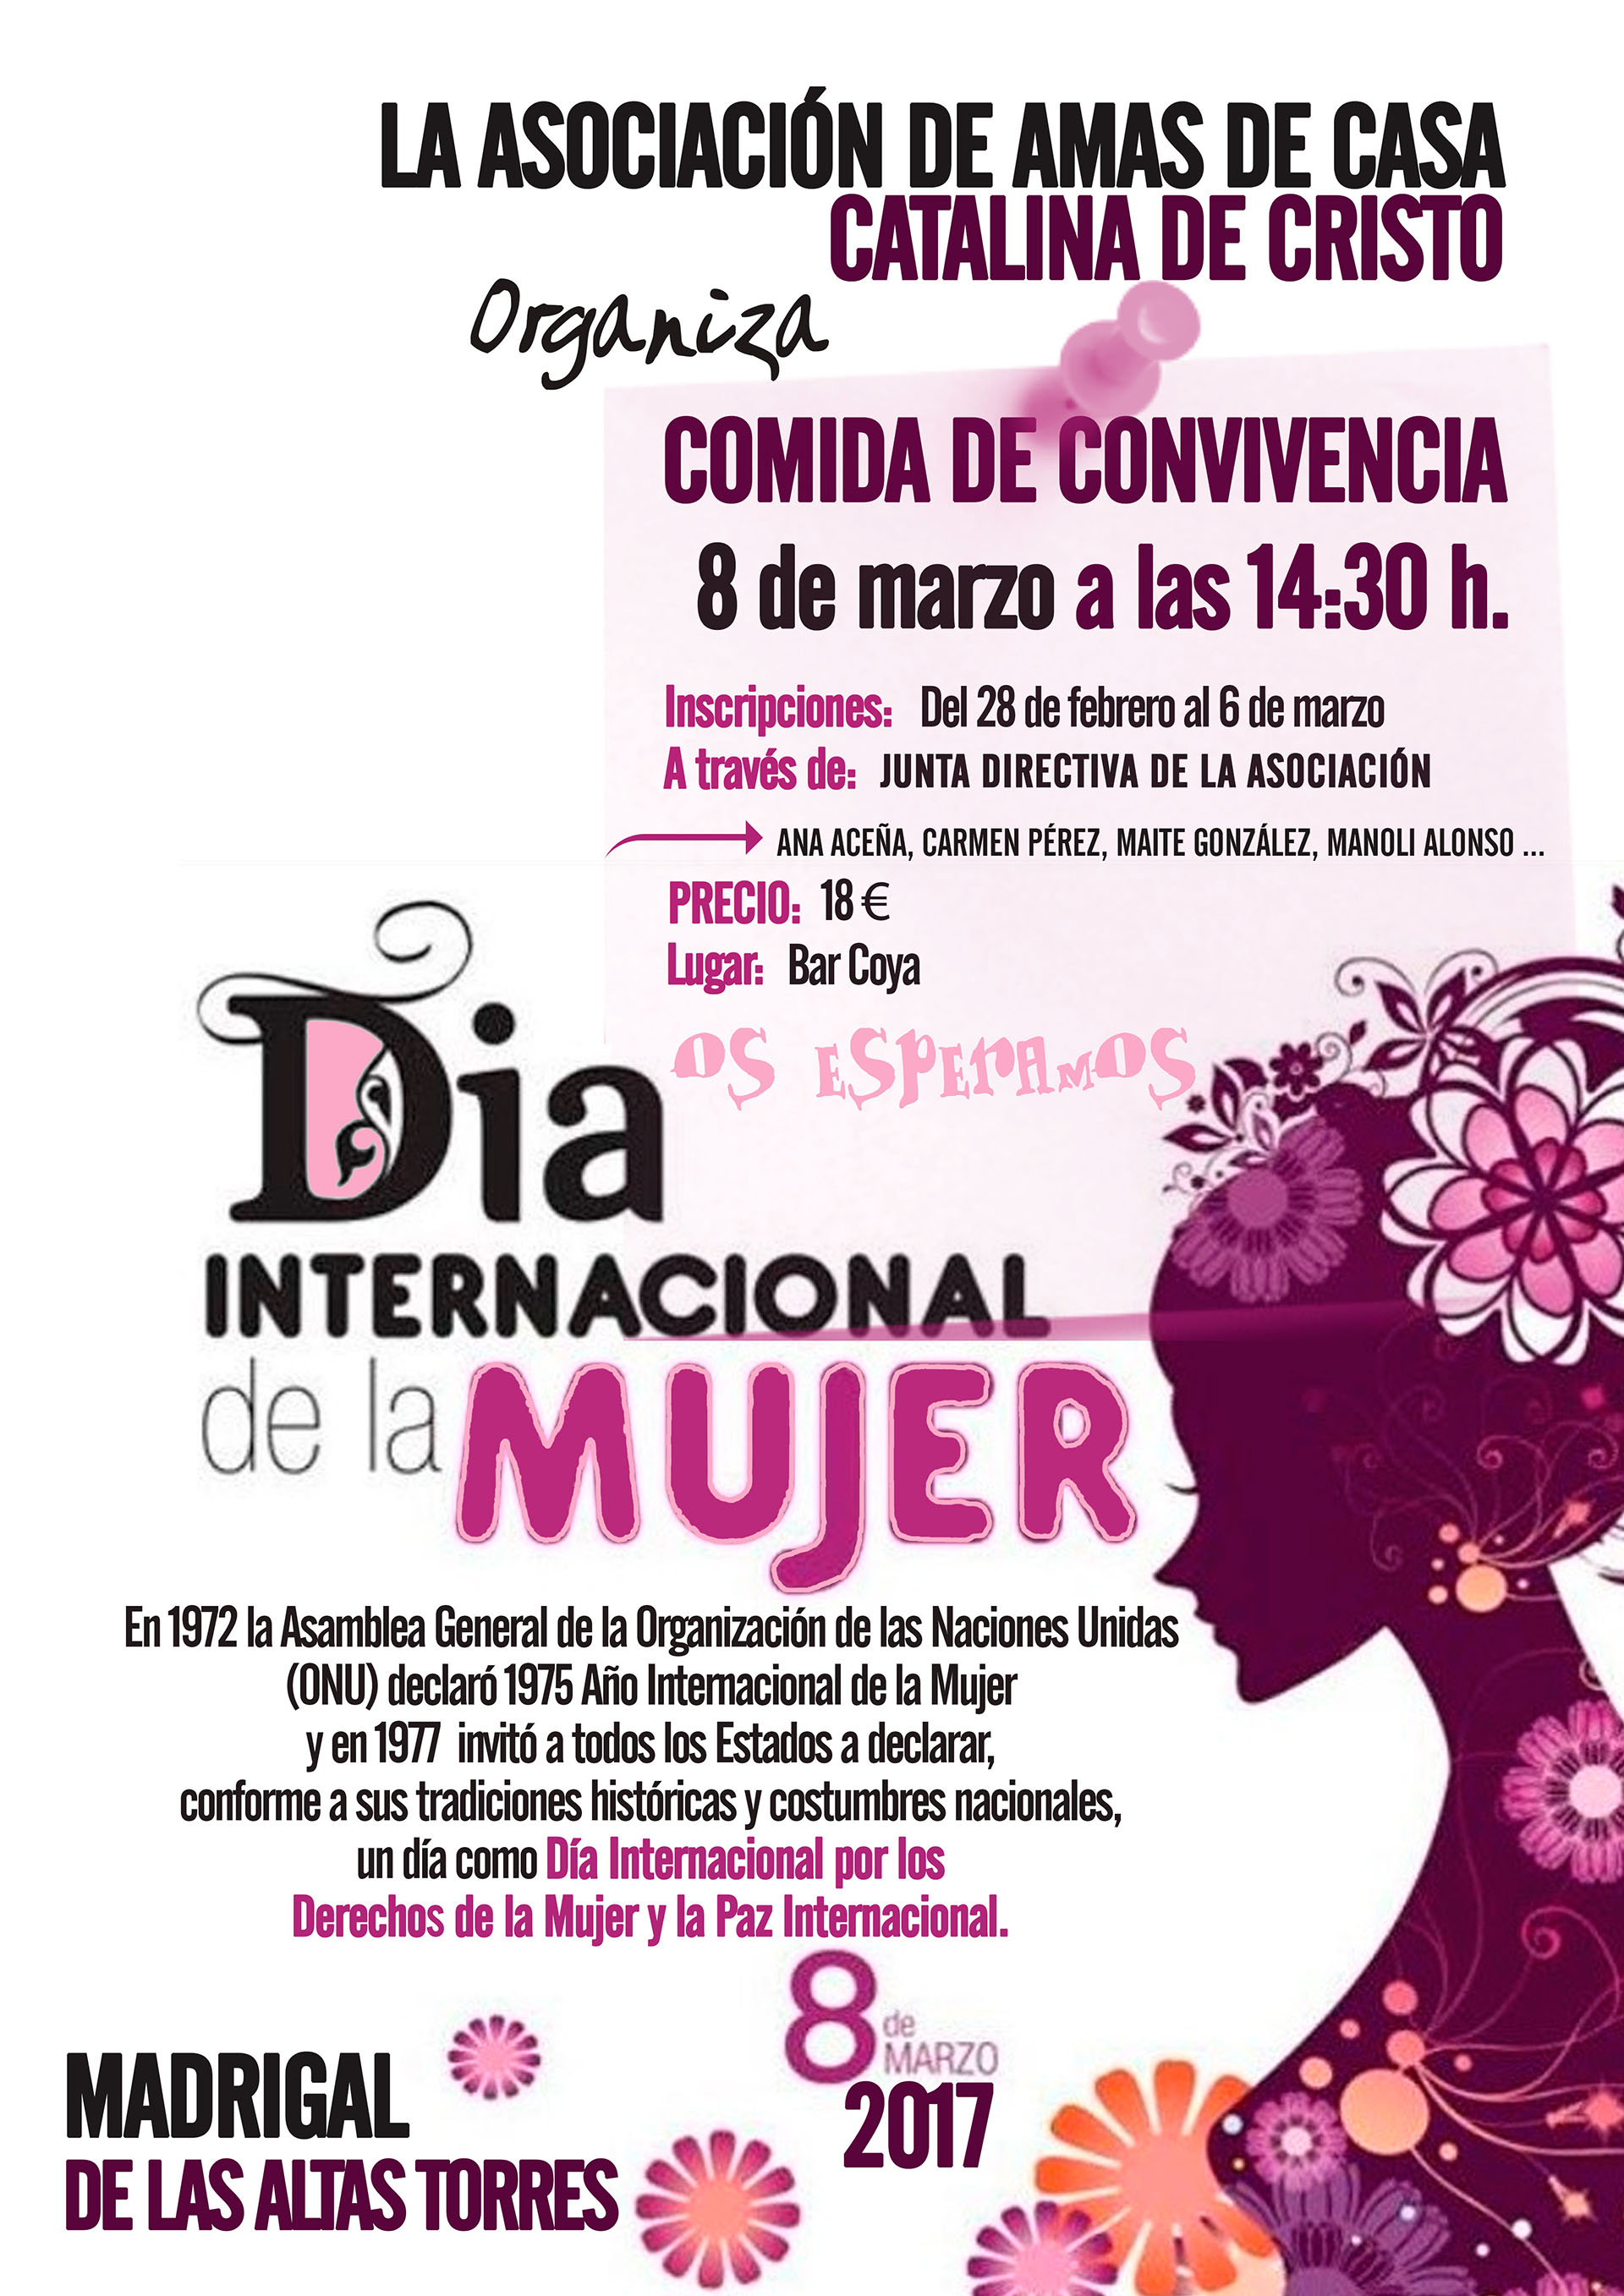 mujertrabajadora2017